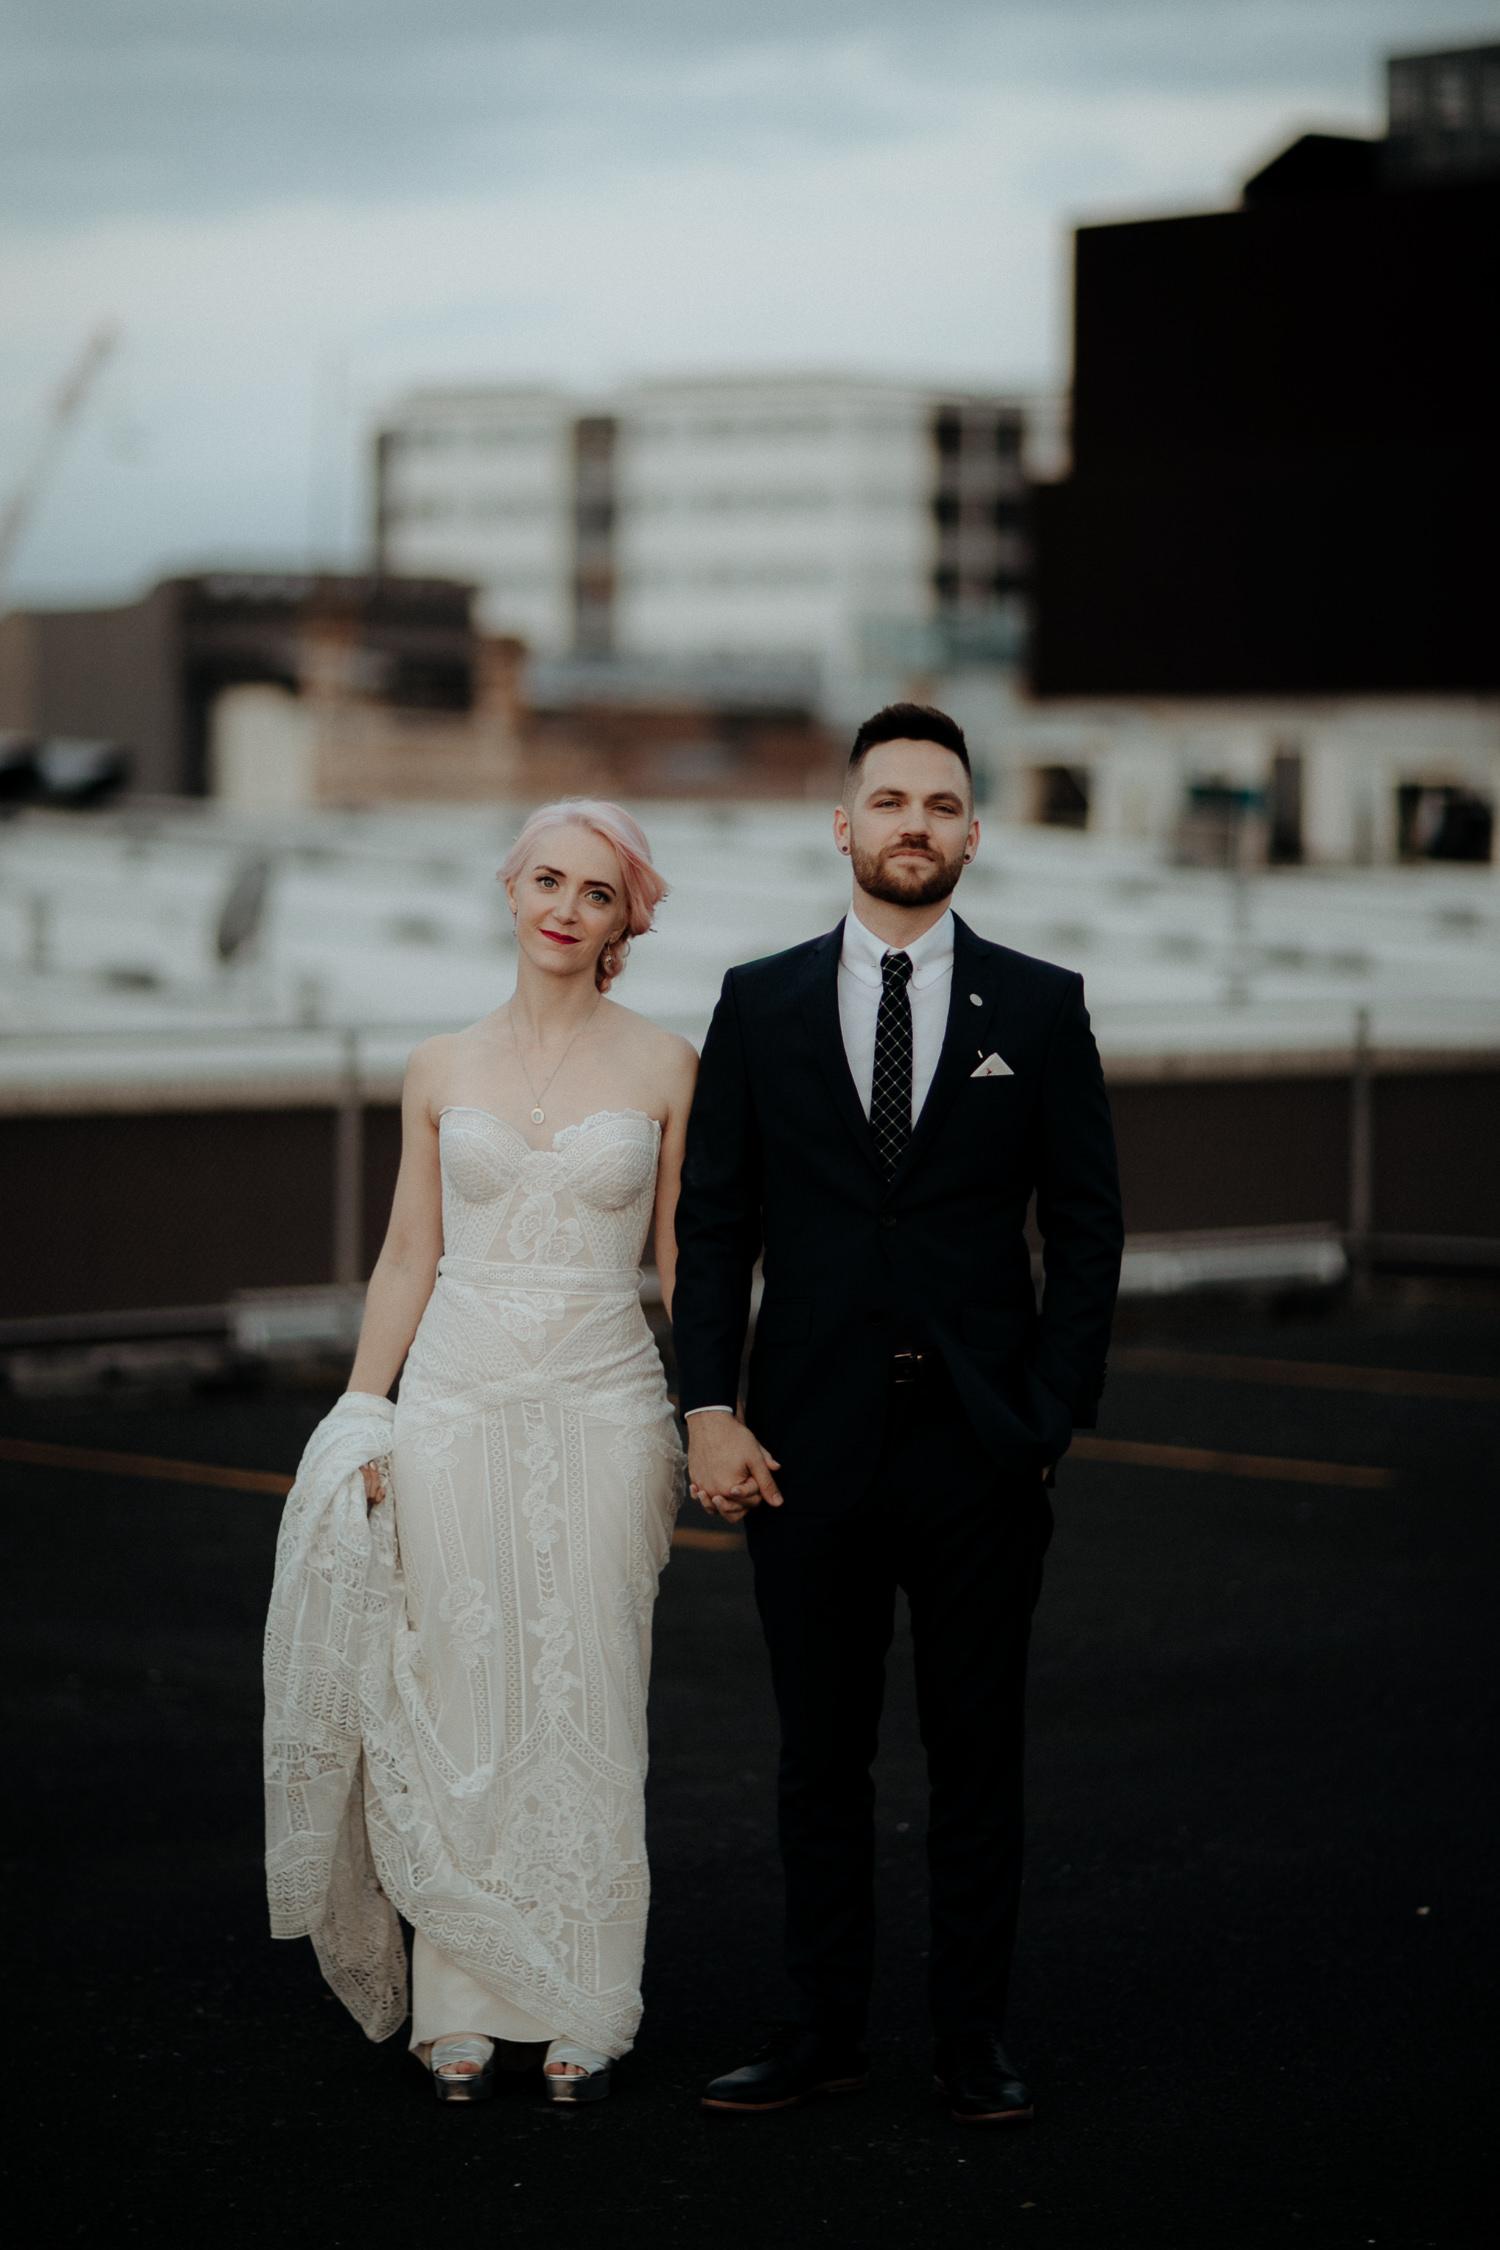 auckland-city-wedding-25710.jpg